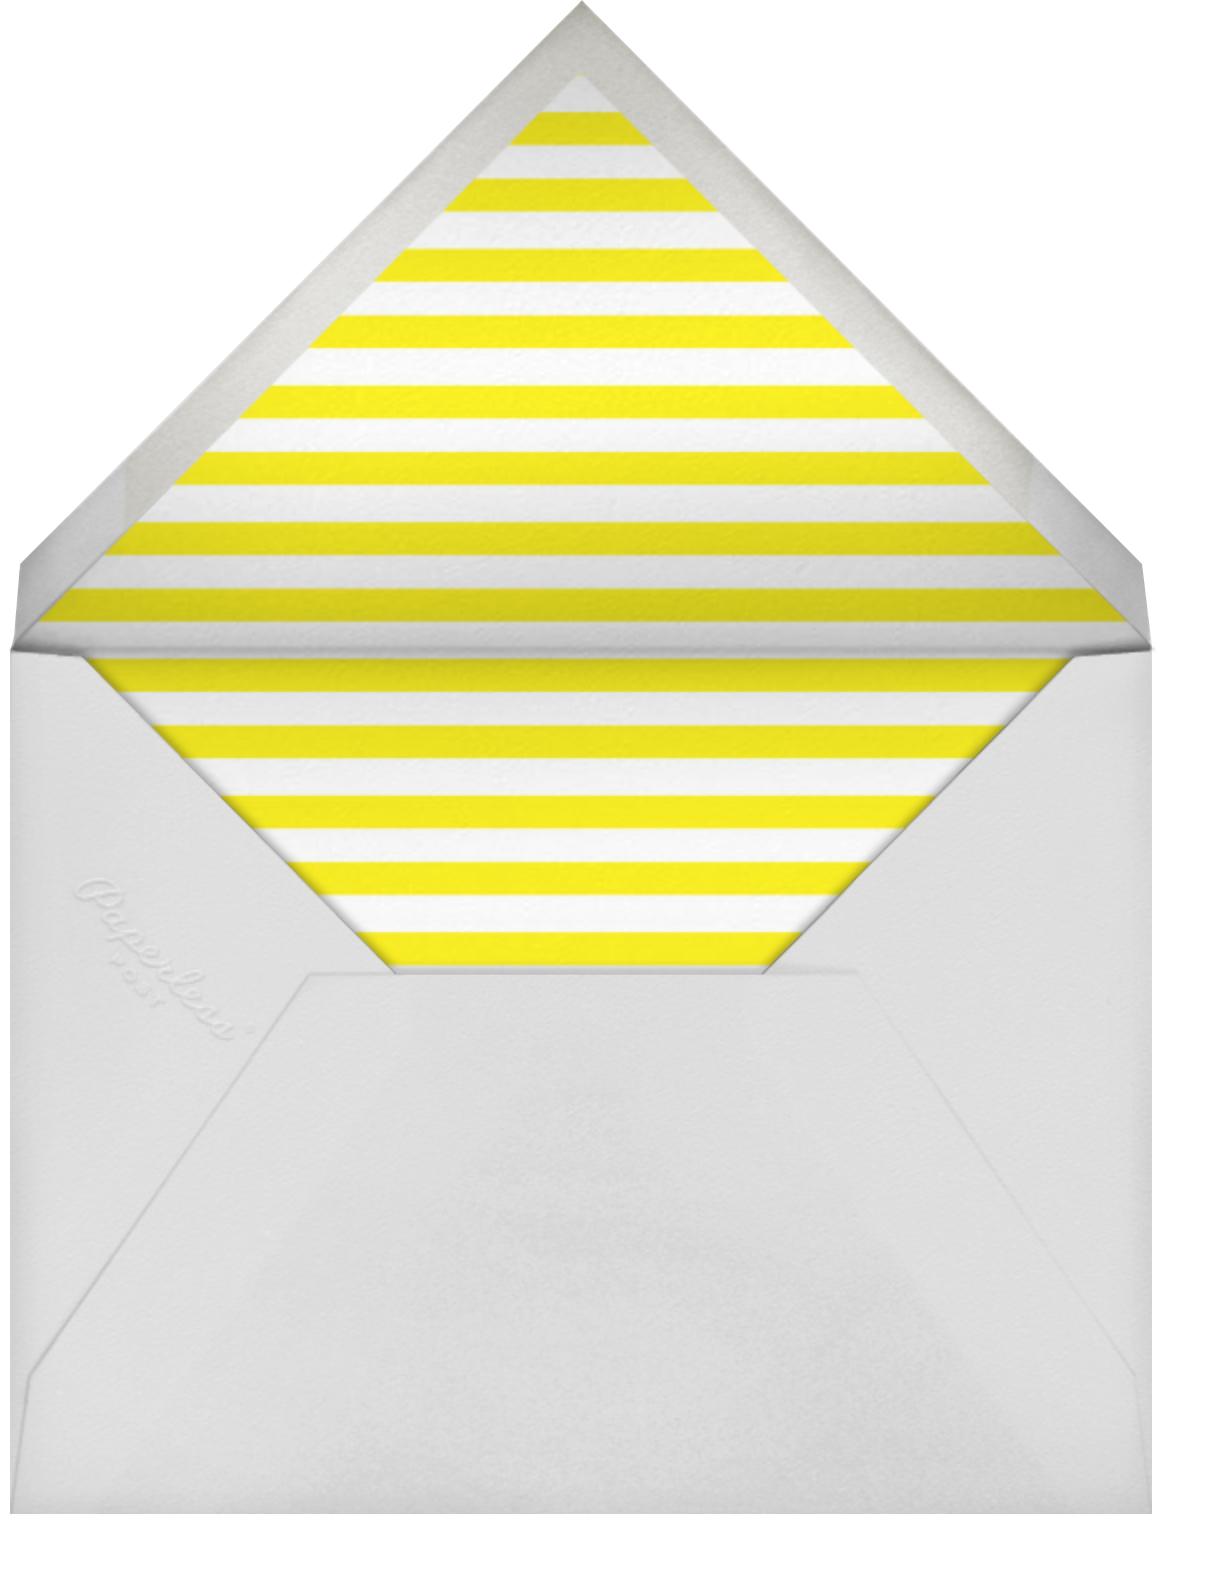 Greenwich (Horizontal) - Paperless Post - Envelope